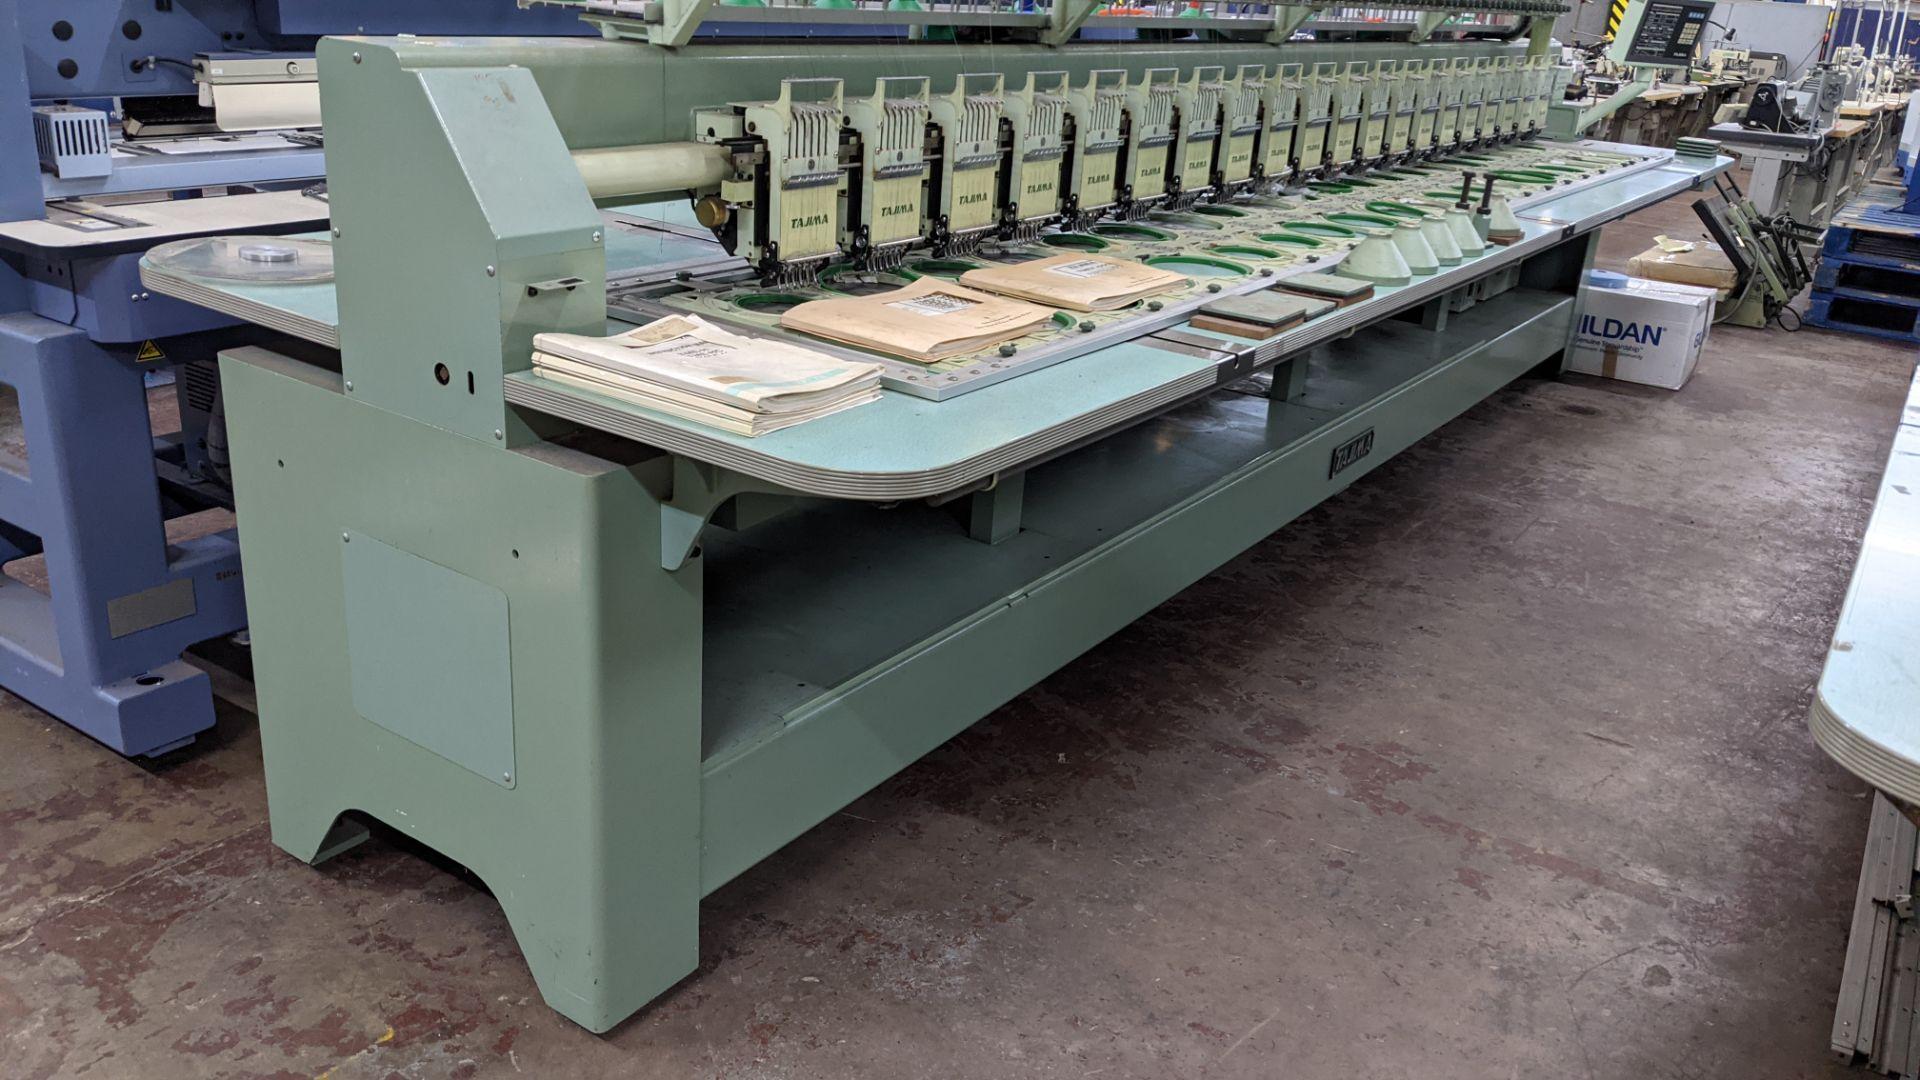 Tokai Tajima electronic 20 head automatic embroidery machine model TMEF-H620 - Image 14 of 25